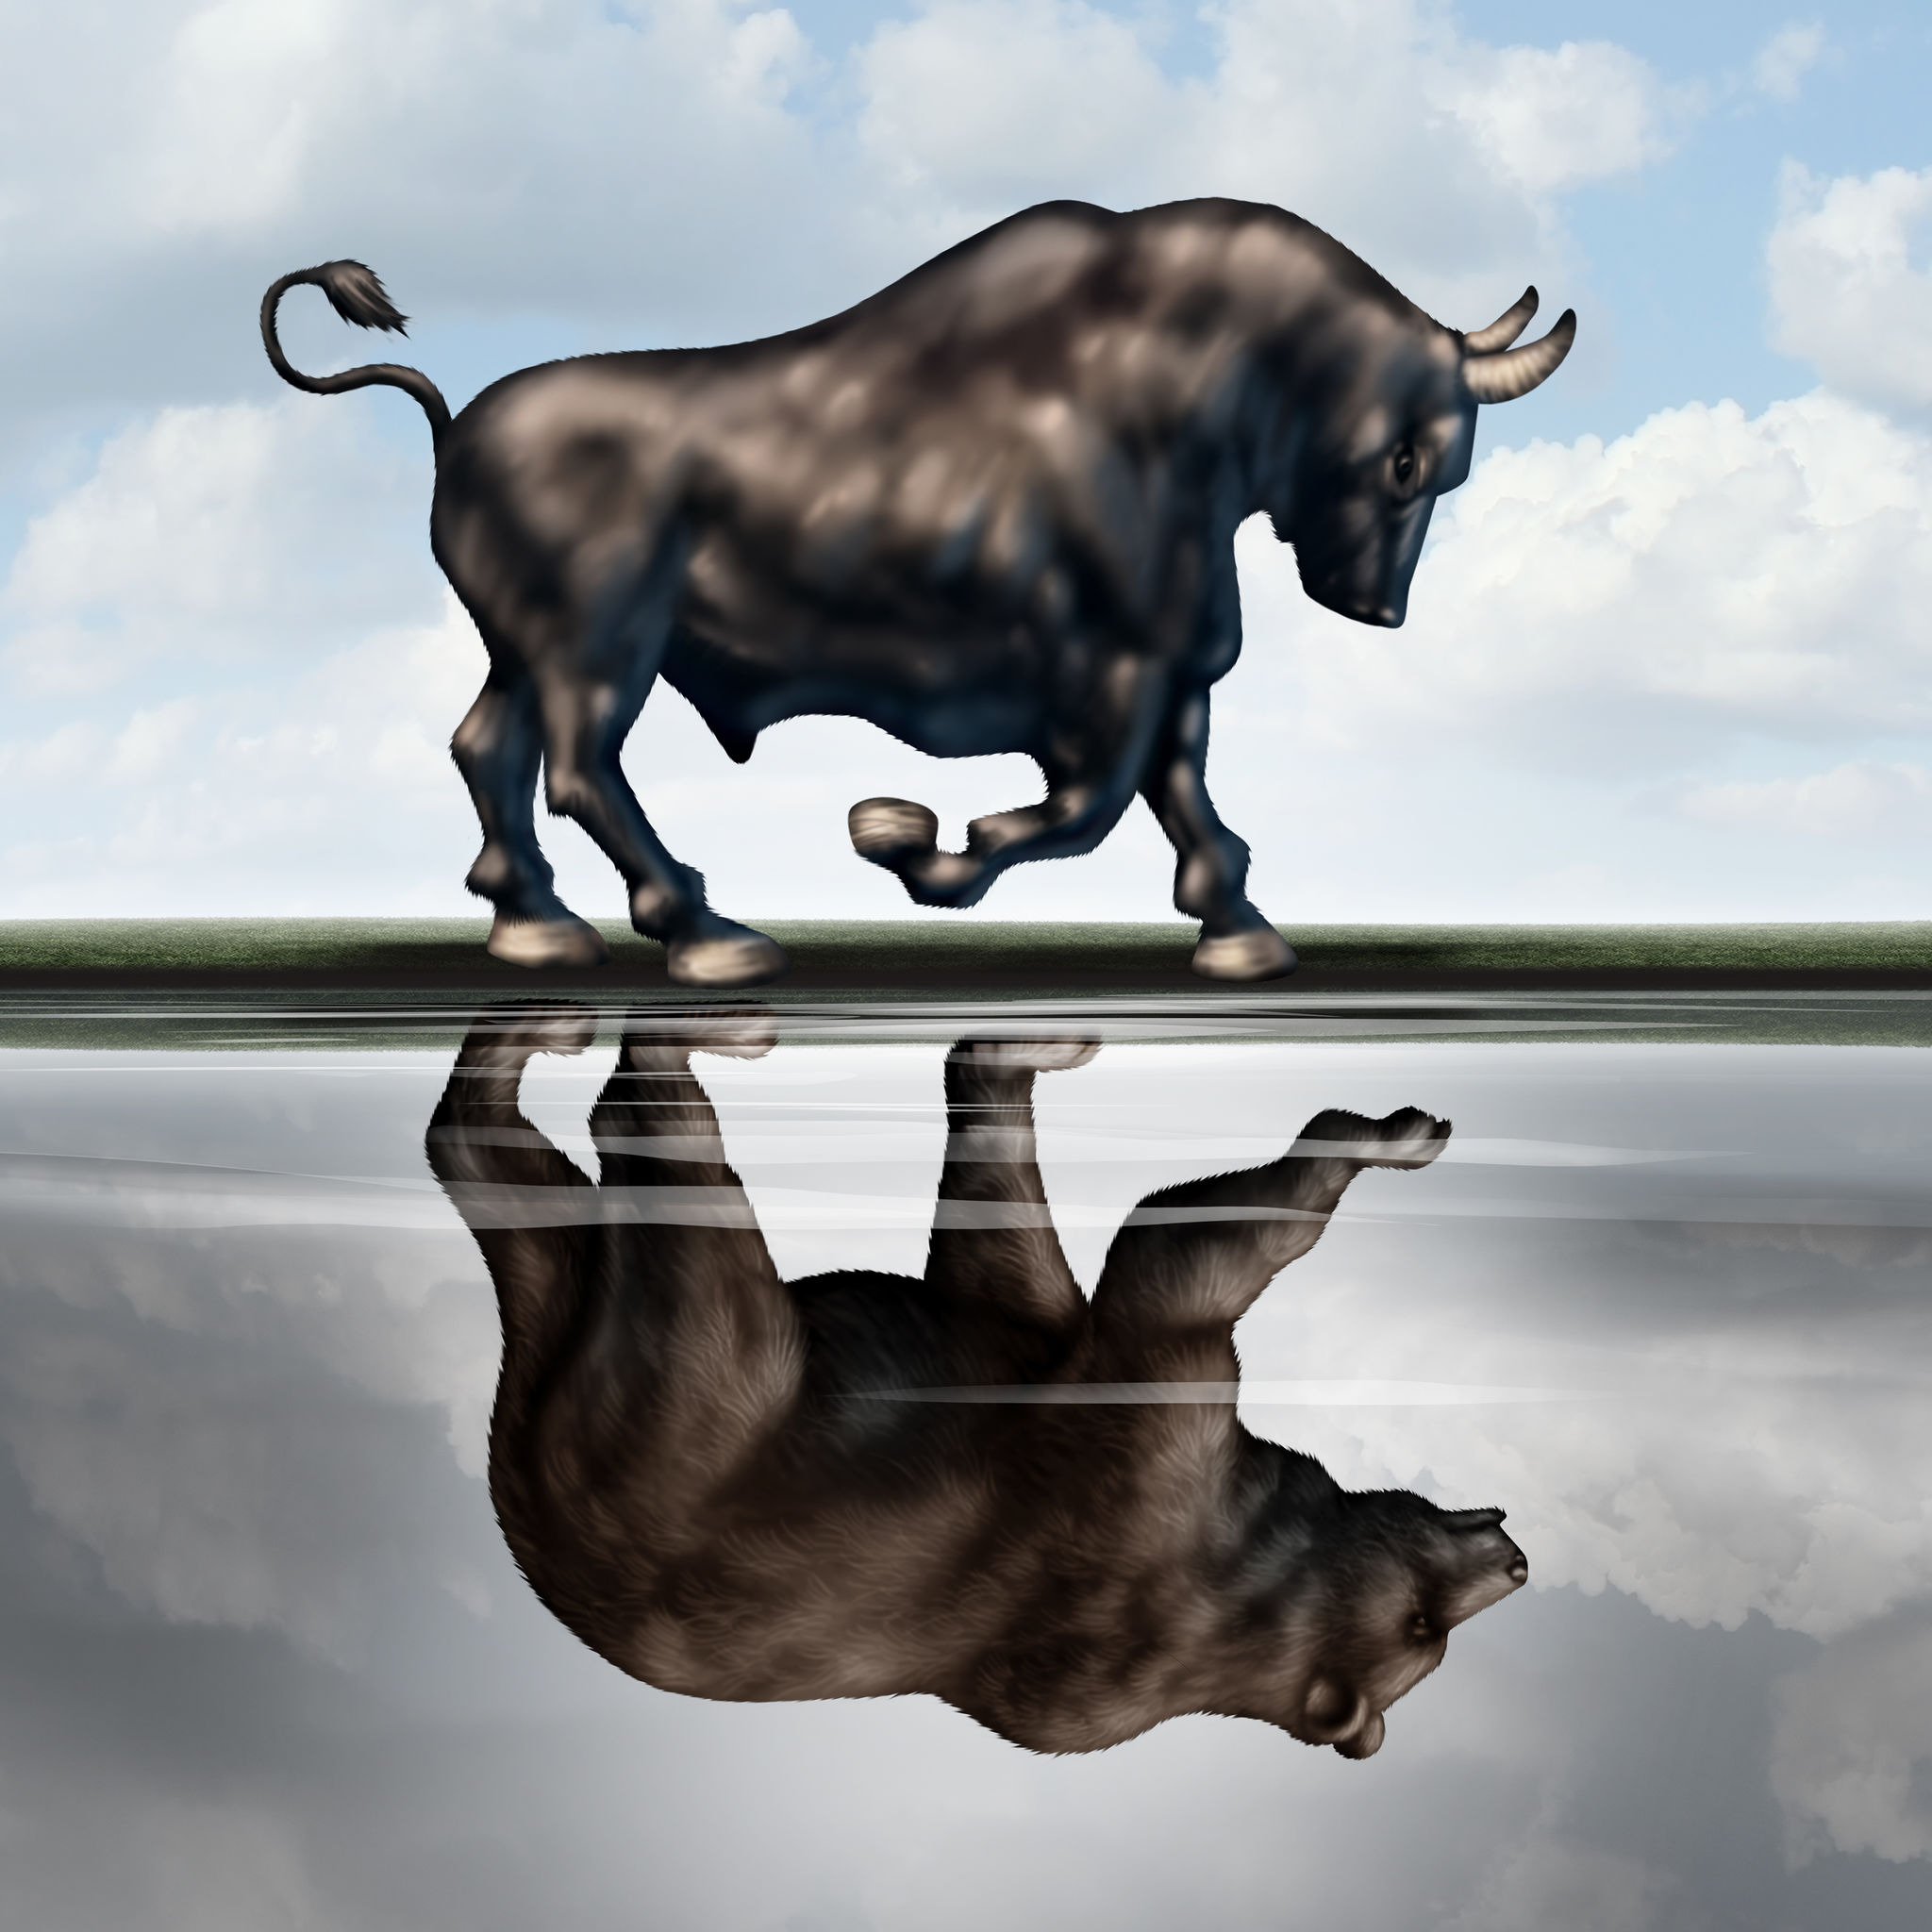 Býk vs Medvěd, Bull vs Bear market